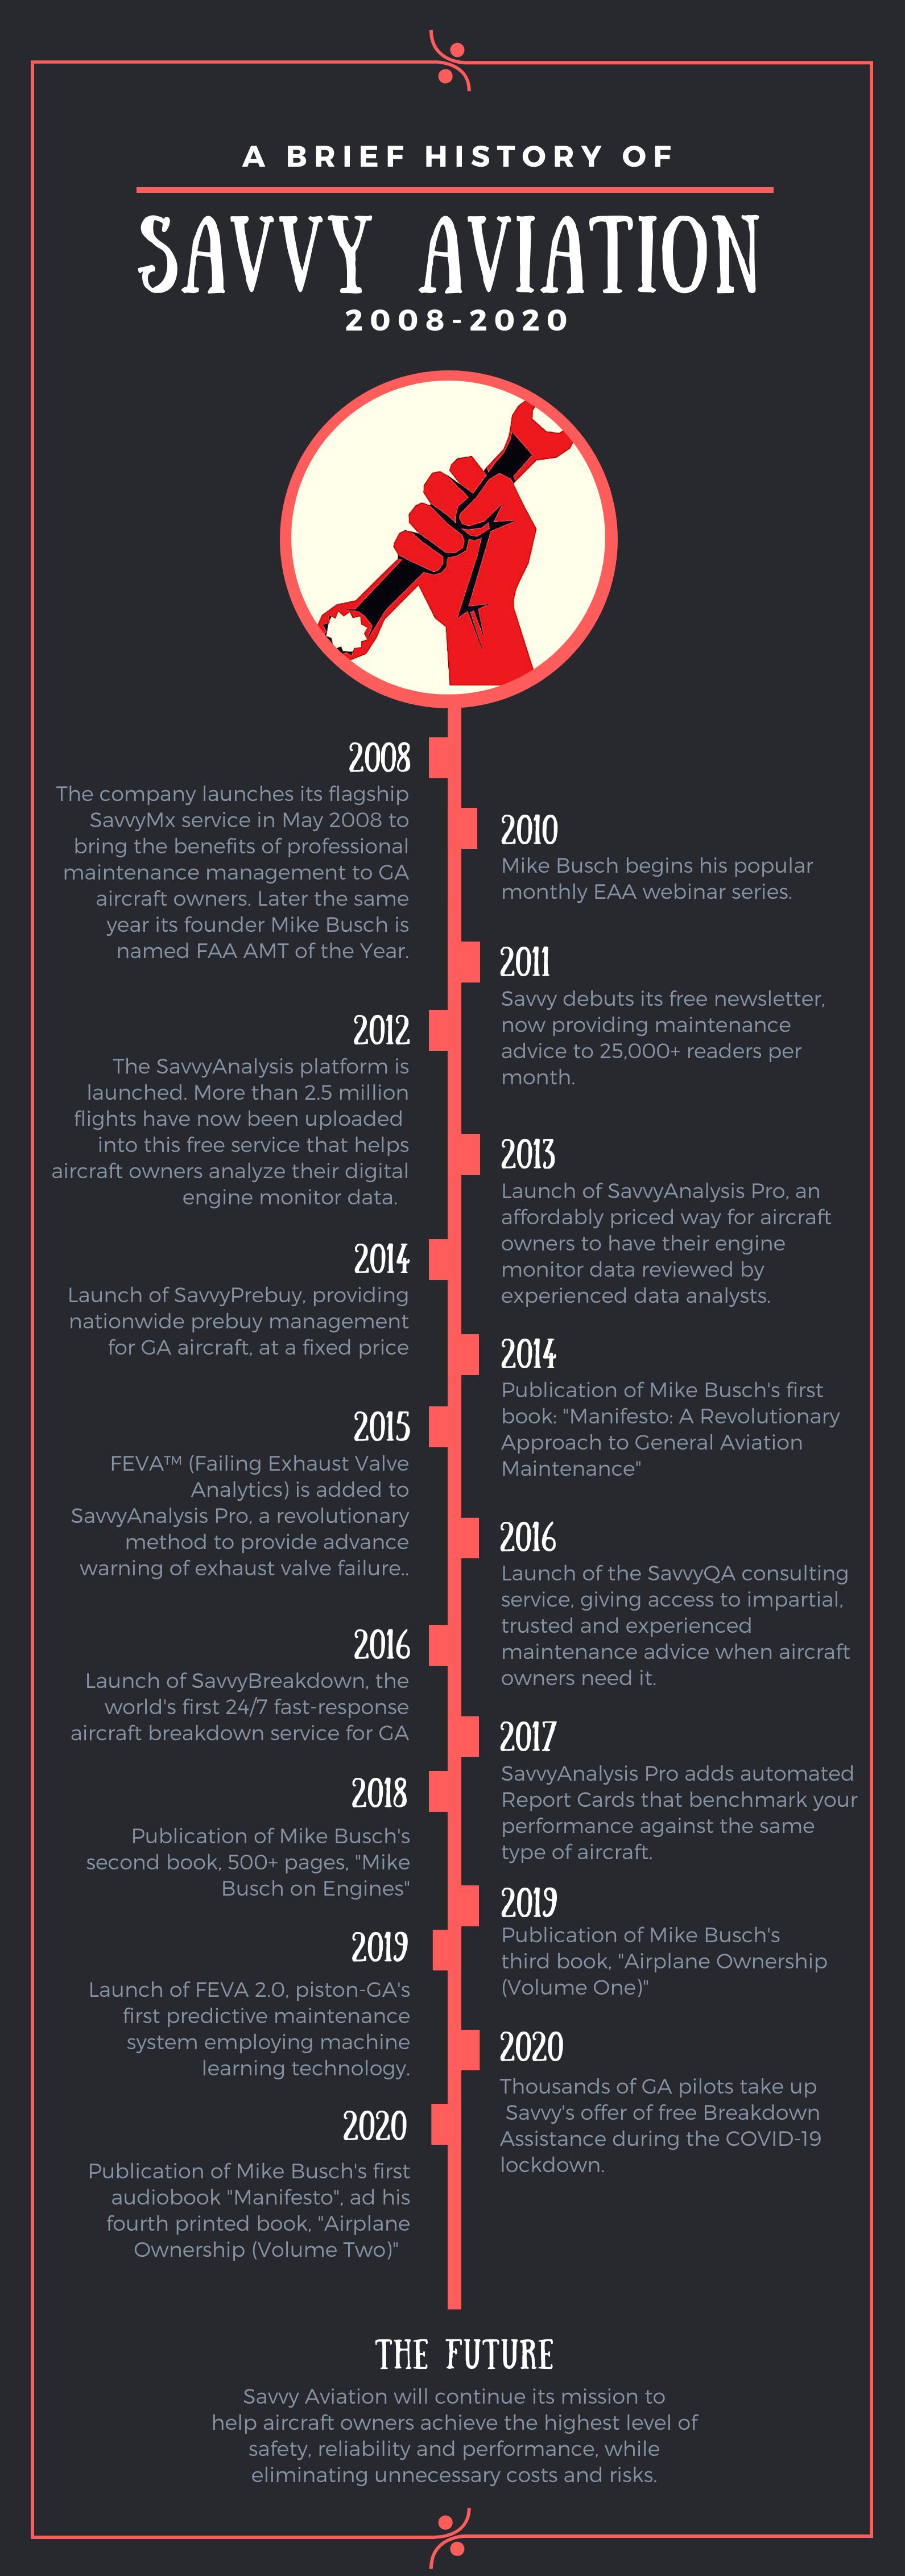 Savvy Aviation Timeline